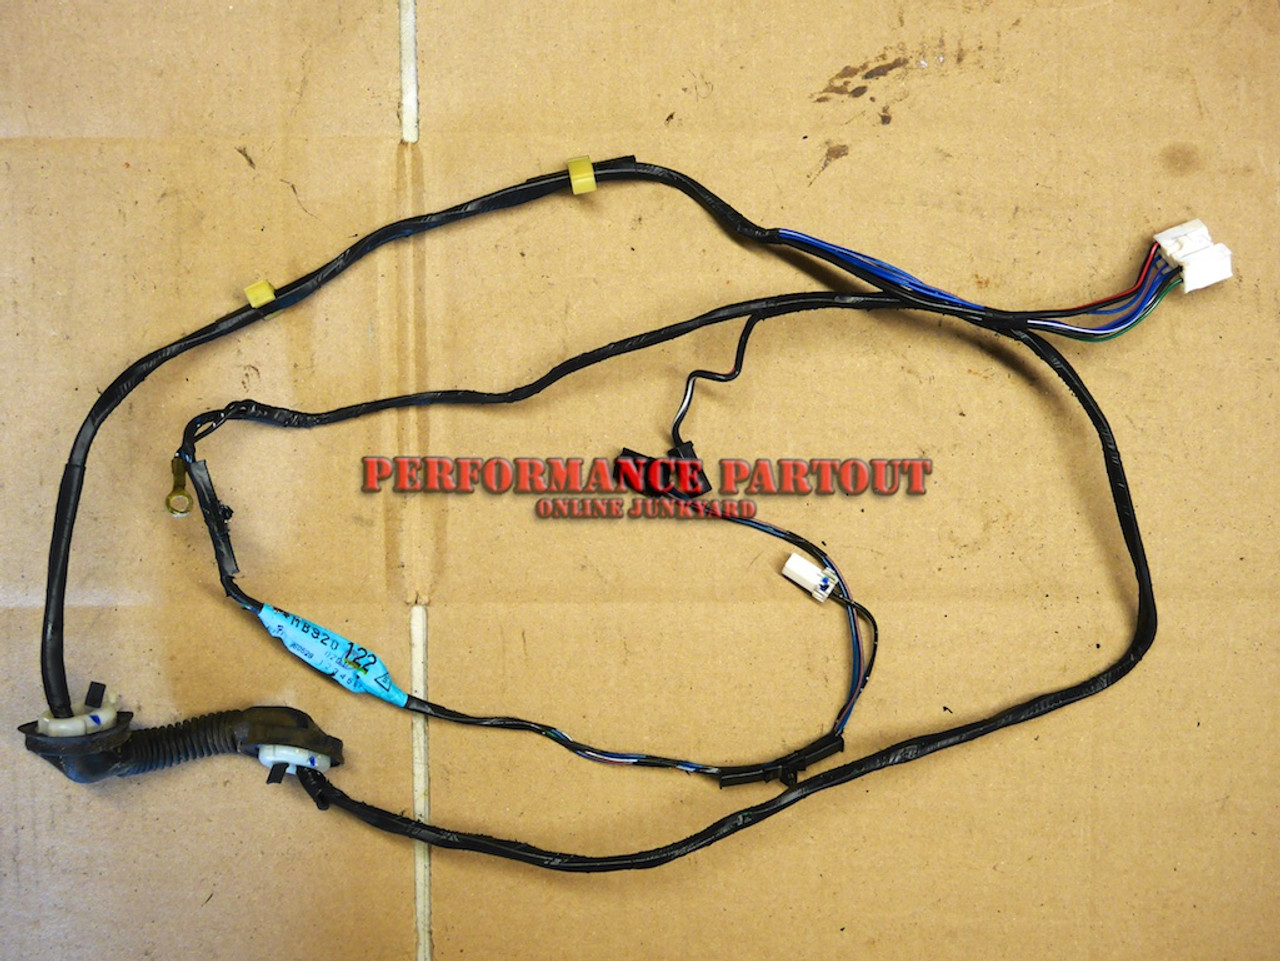 hatch wiring harness 2g dsm performance partout 2008 subaru outback hatch wiring harness hatch wiring harness [ 1280 x 961 Pixel ]